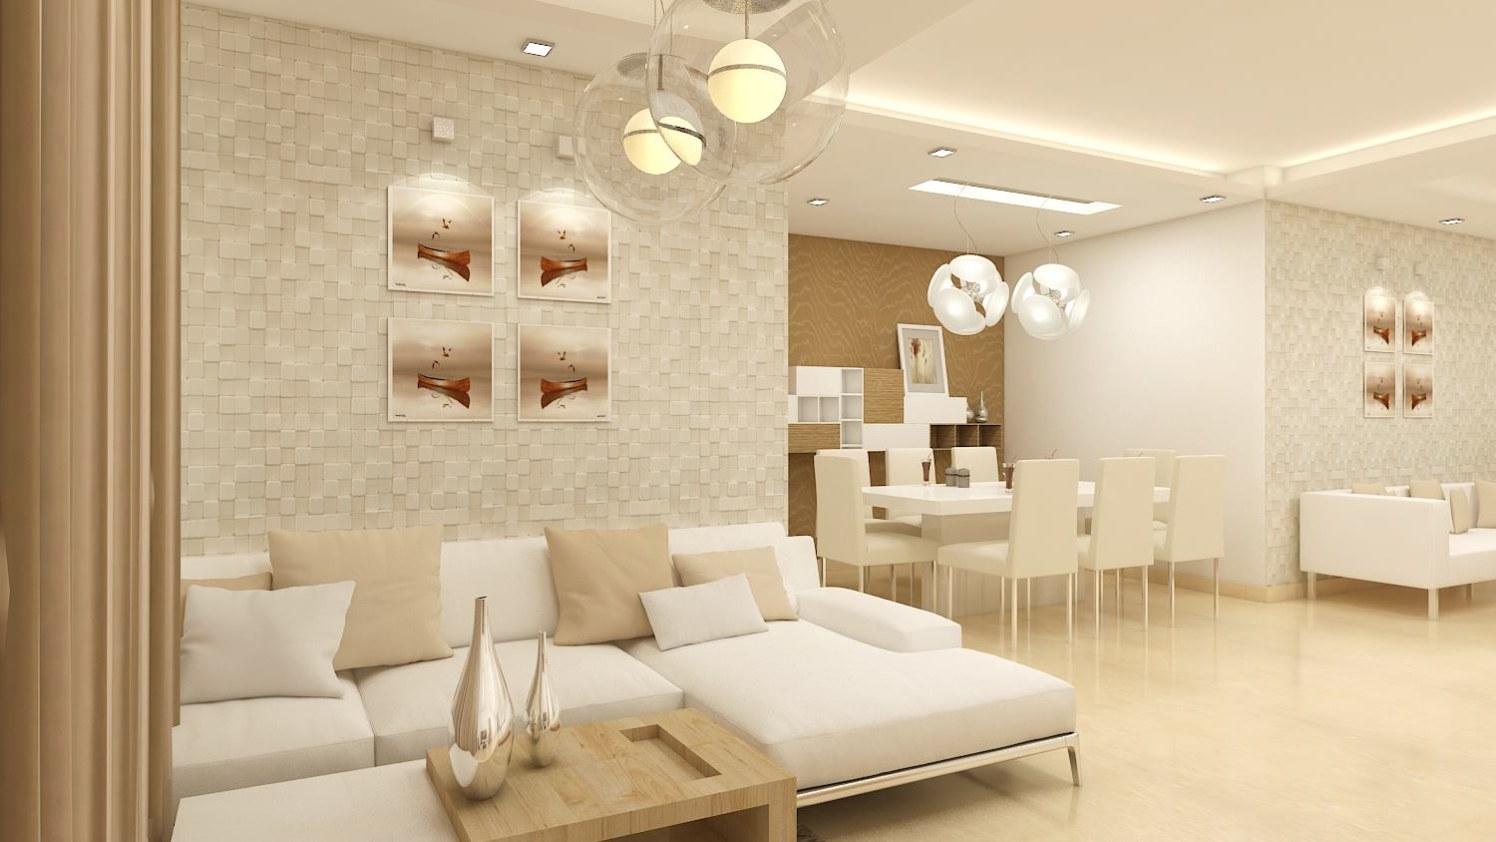 Modern Dining room by De Panache Interior Architecture  Dining-room Modern | Interior Design Photos & Ideas